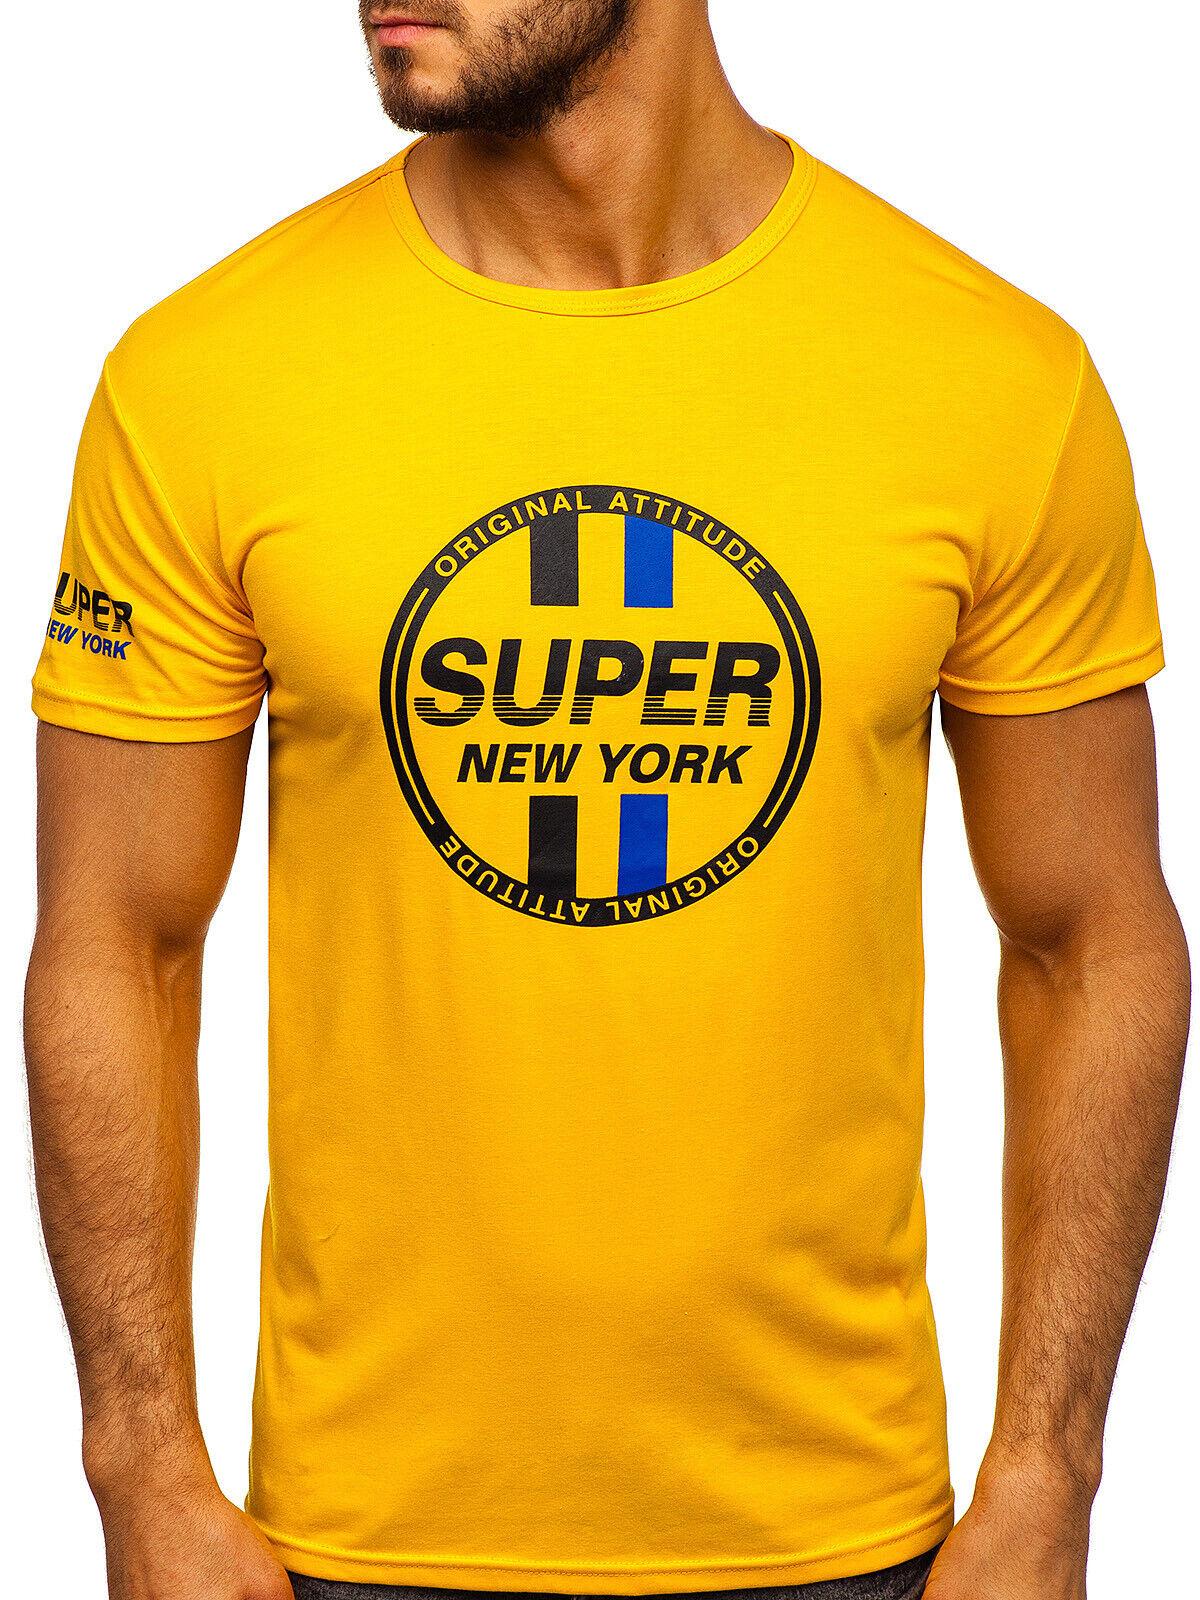 T-Shirt Tee Kurzarm Rundhals Classic Casual Aufdruck Motiv Herren BOLF Sport